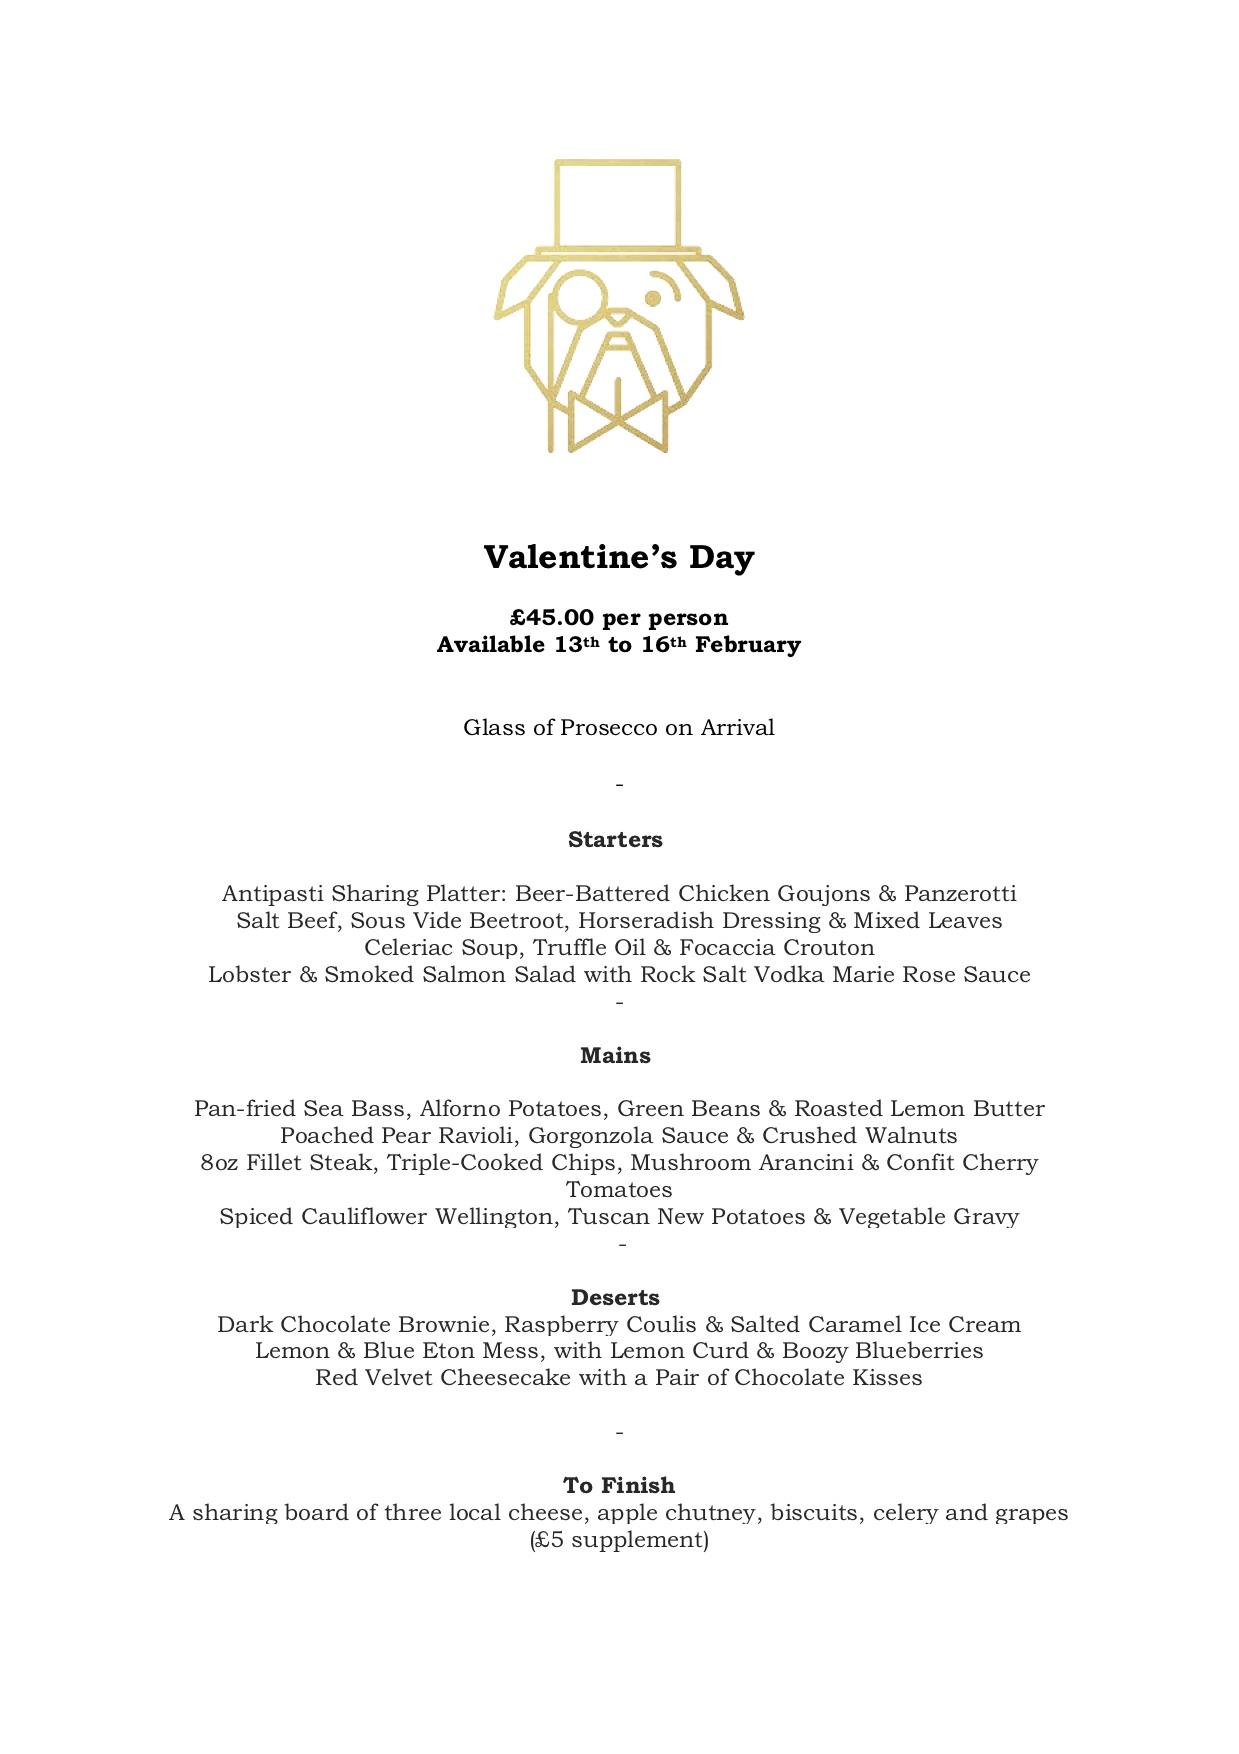 Valetine's Day Monty's.jpg